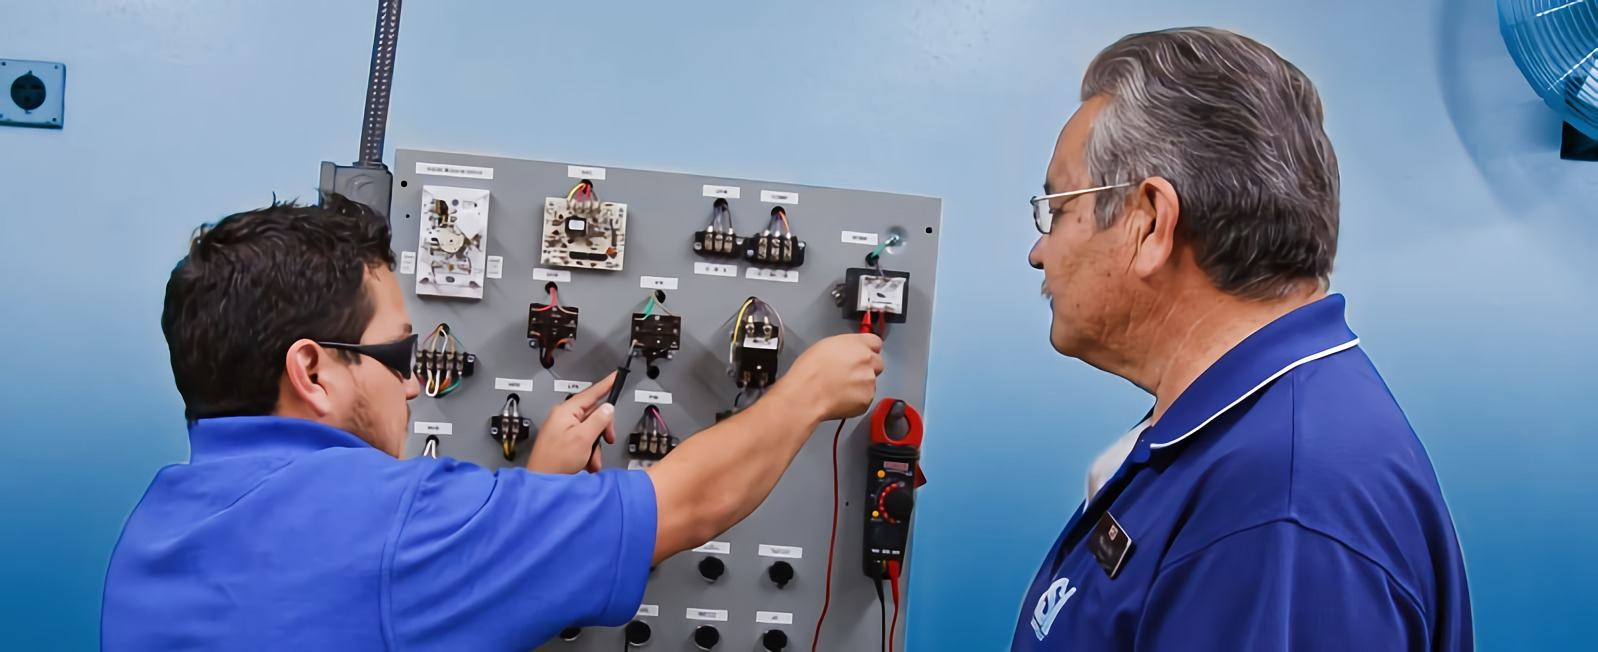 RSI Refrigeration School Training Equipment